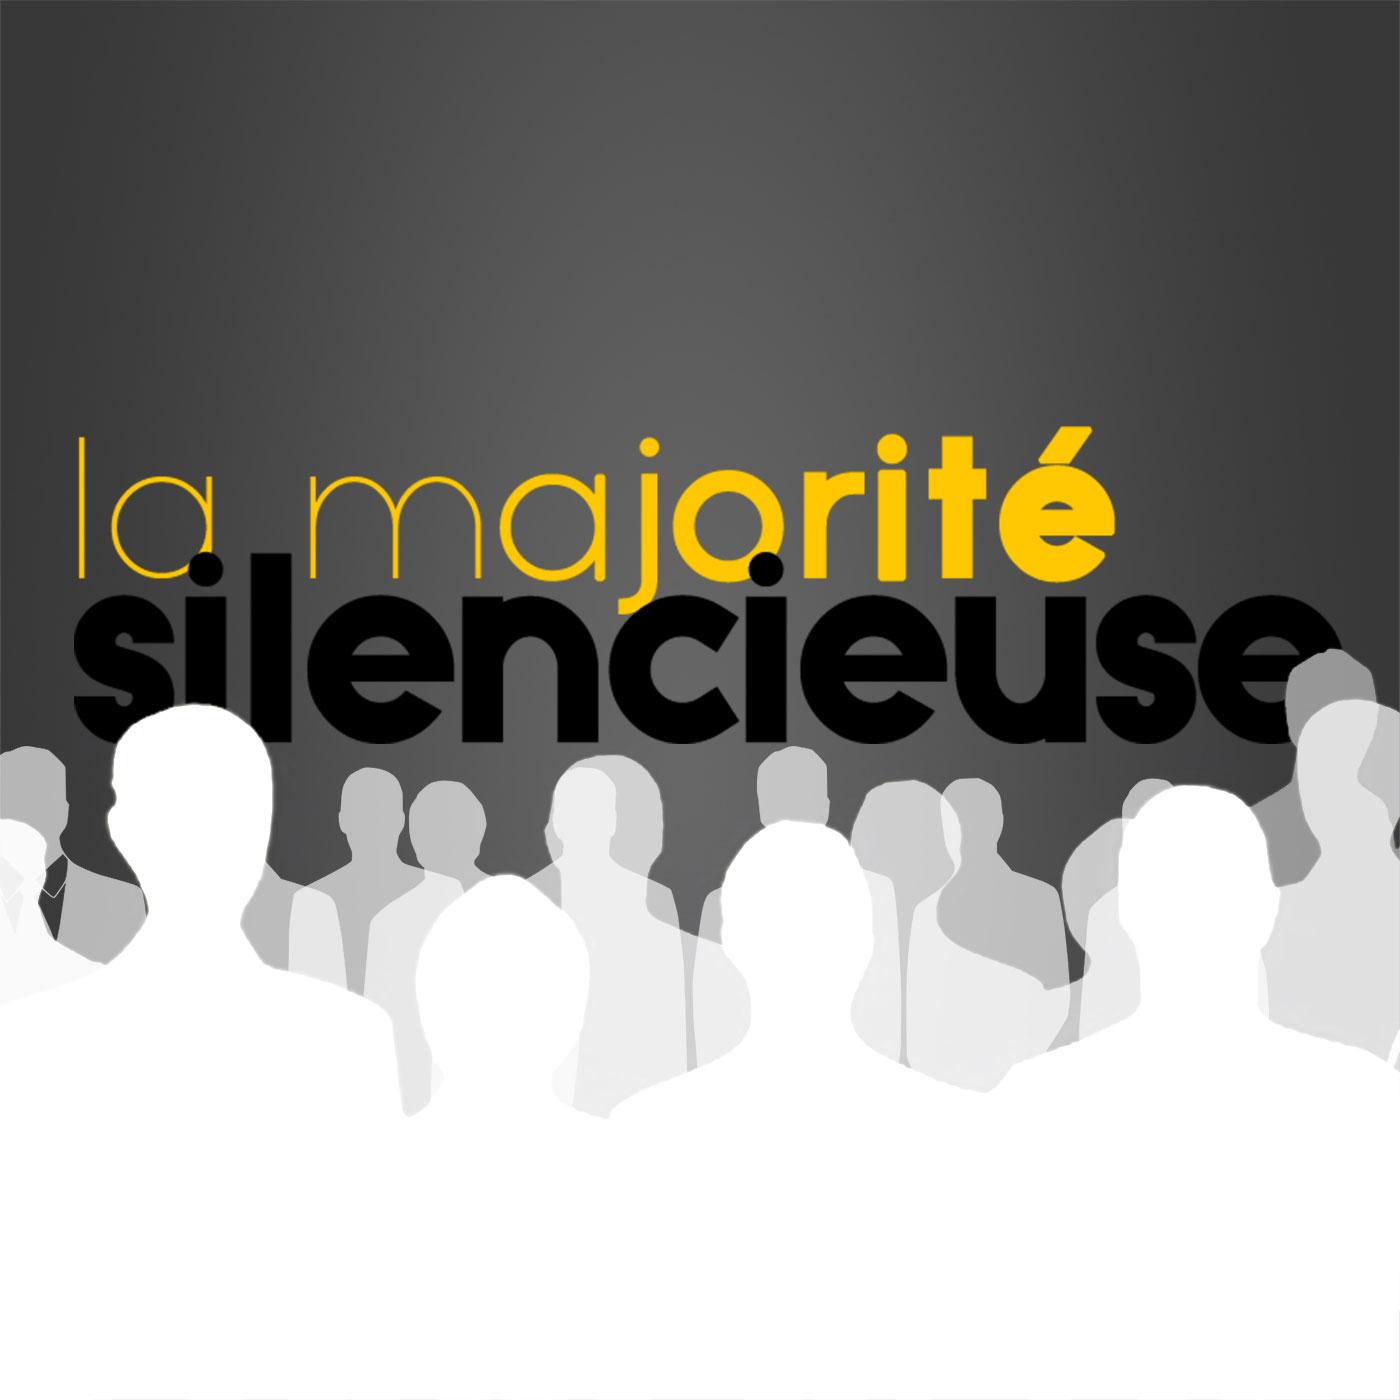 La Majorité silencieuse